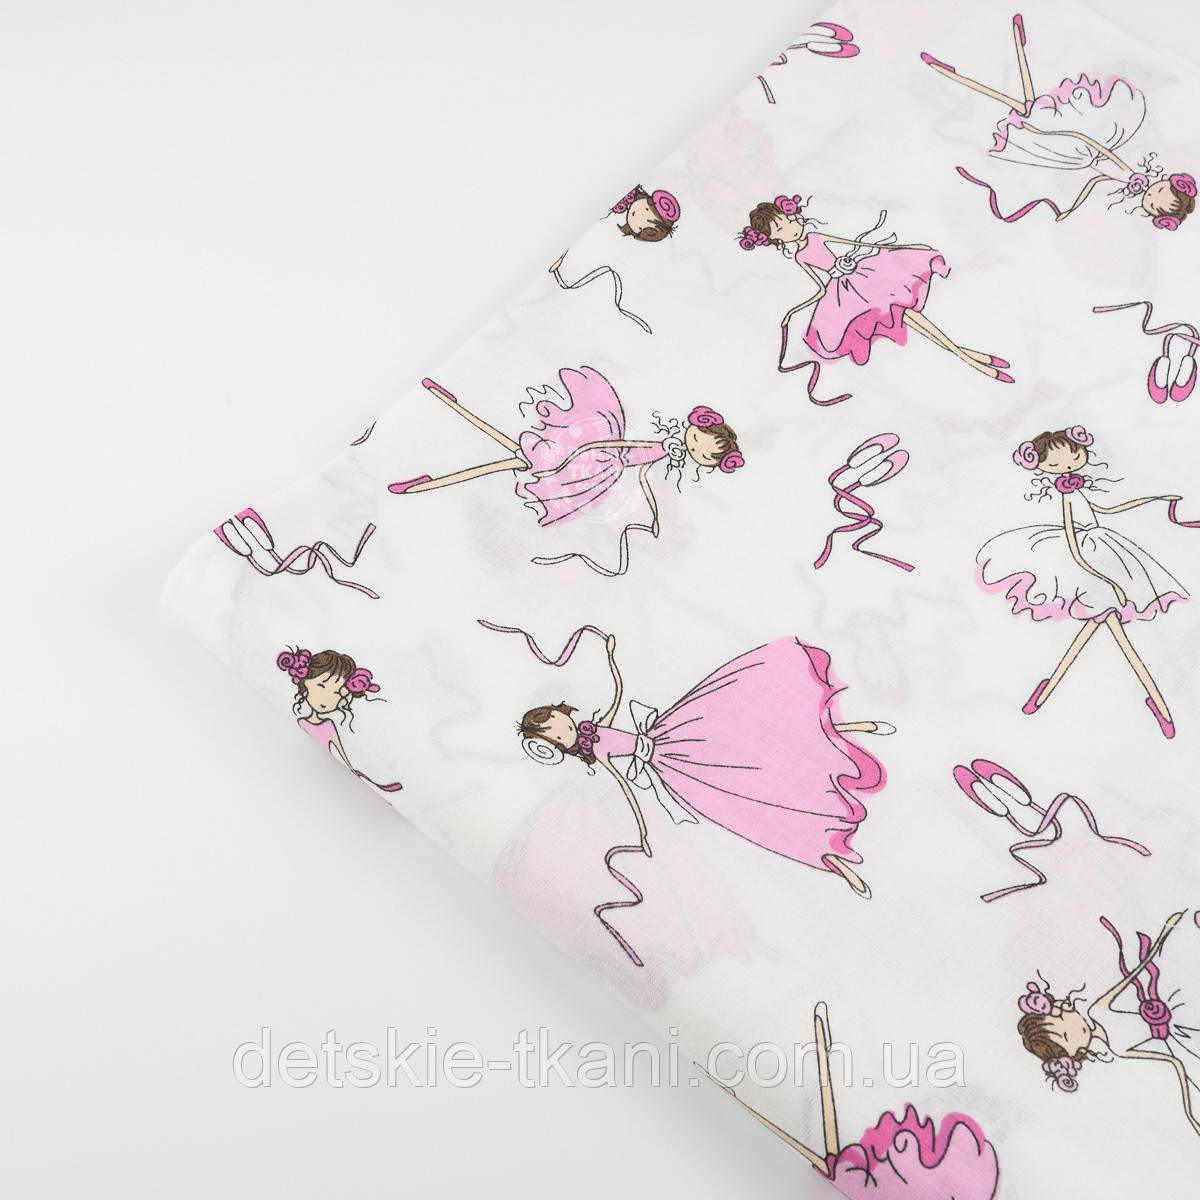 Отрез ткани №439а с балеринами  на белом фоне, размер 70*160